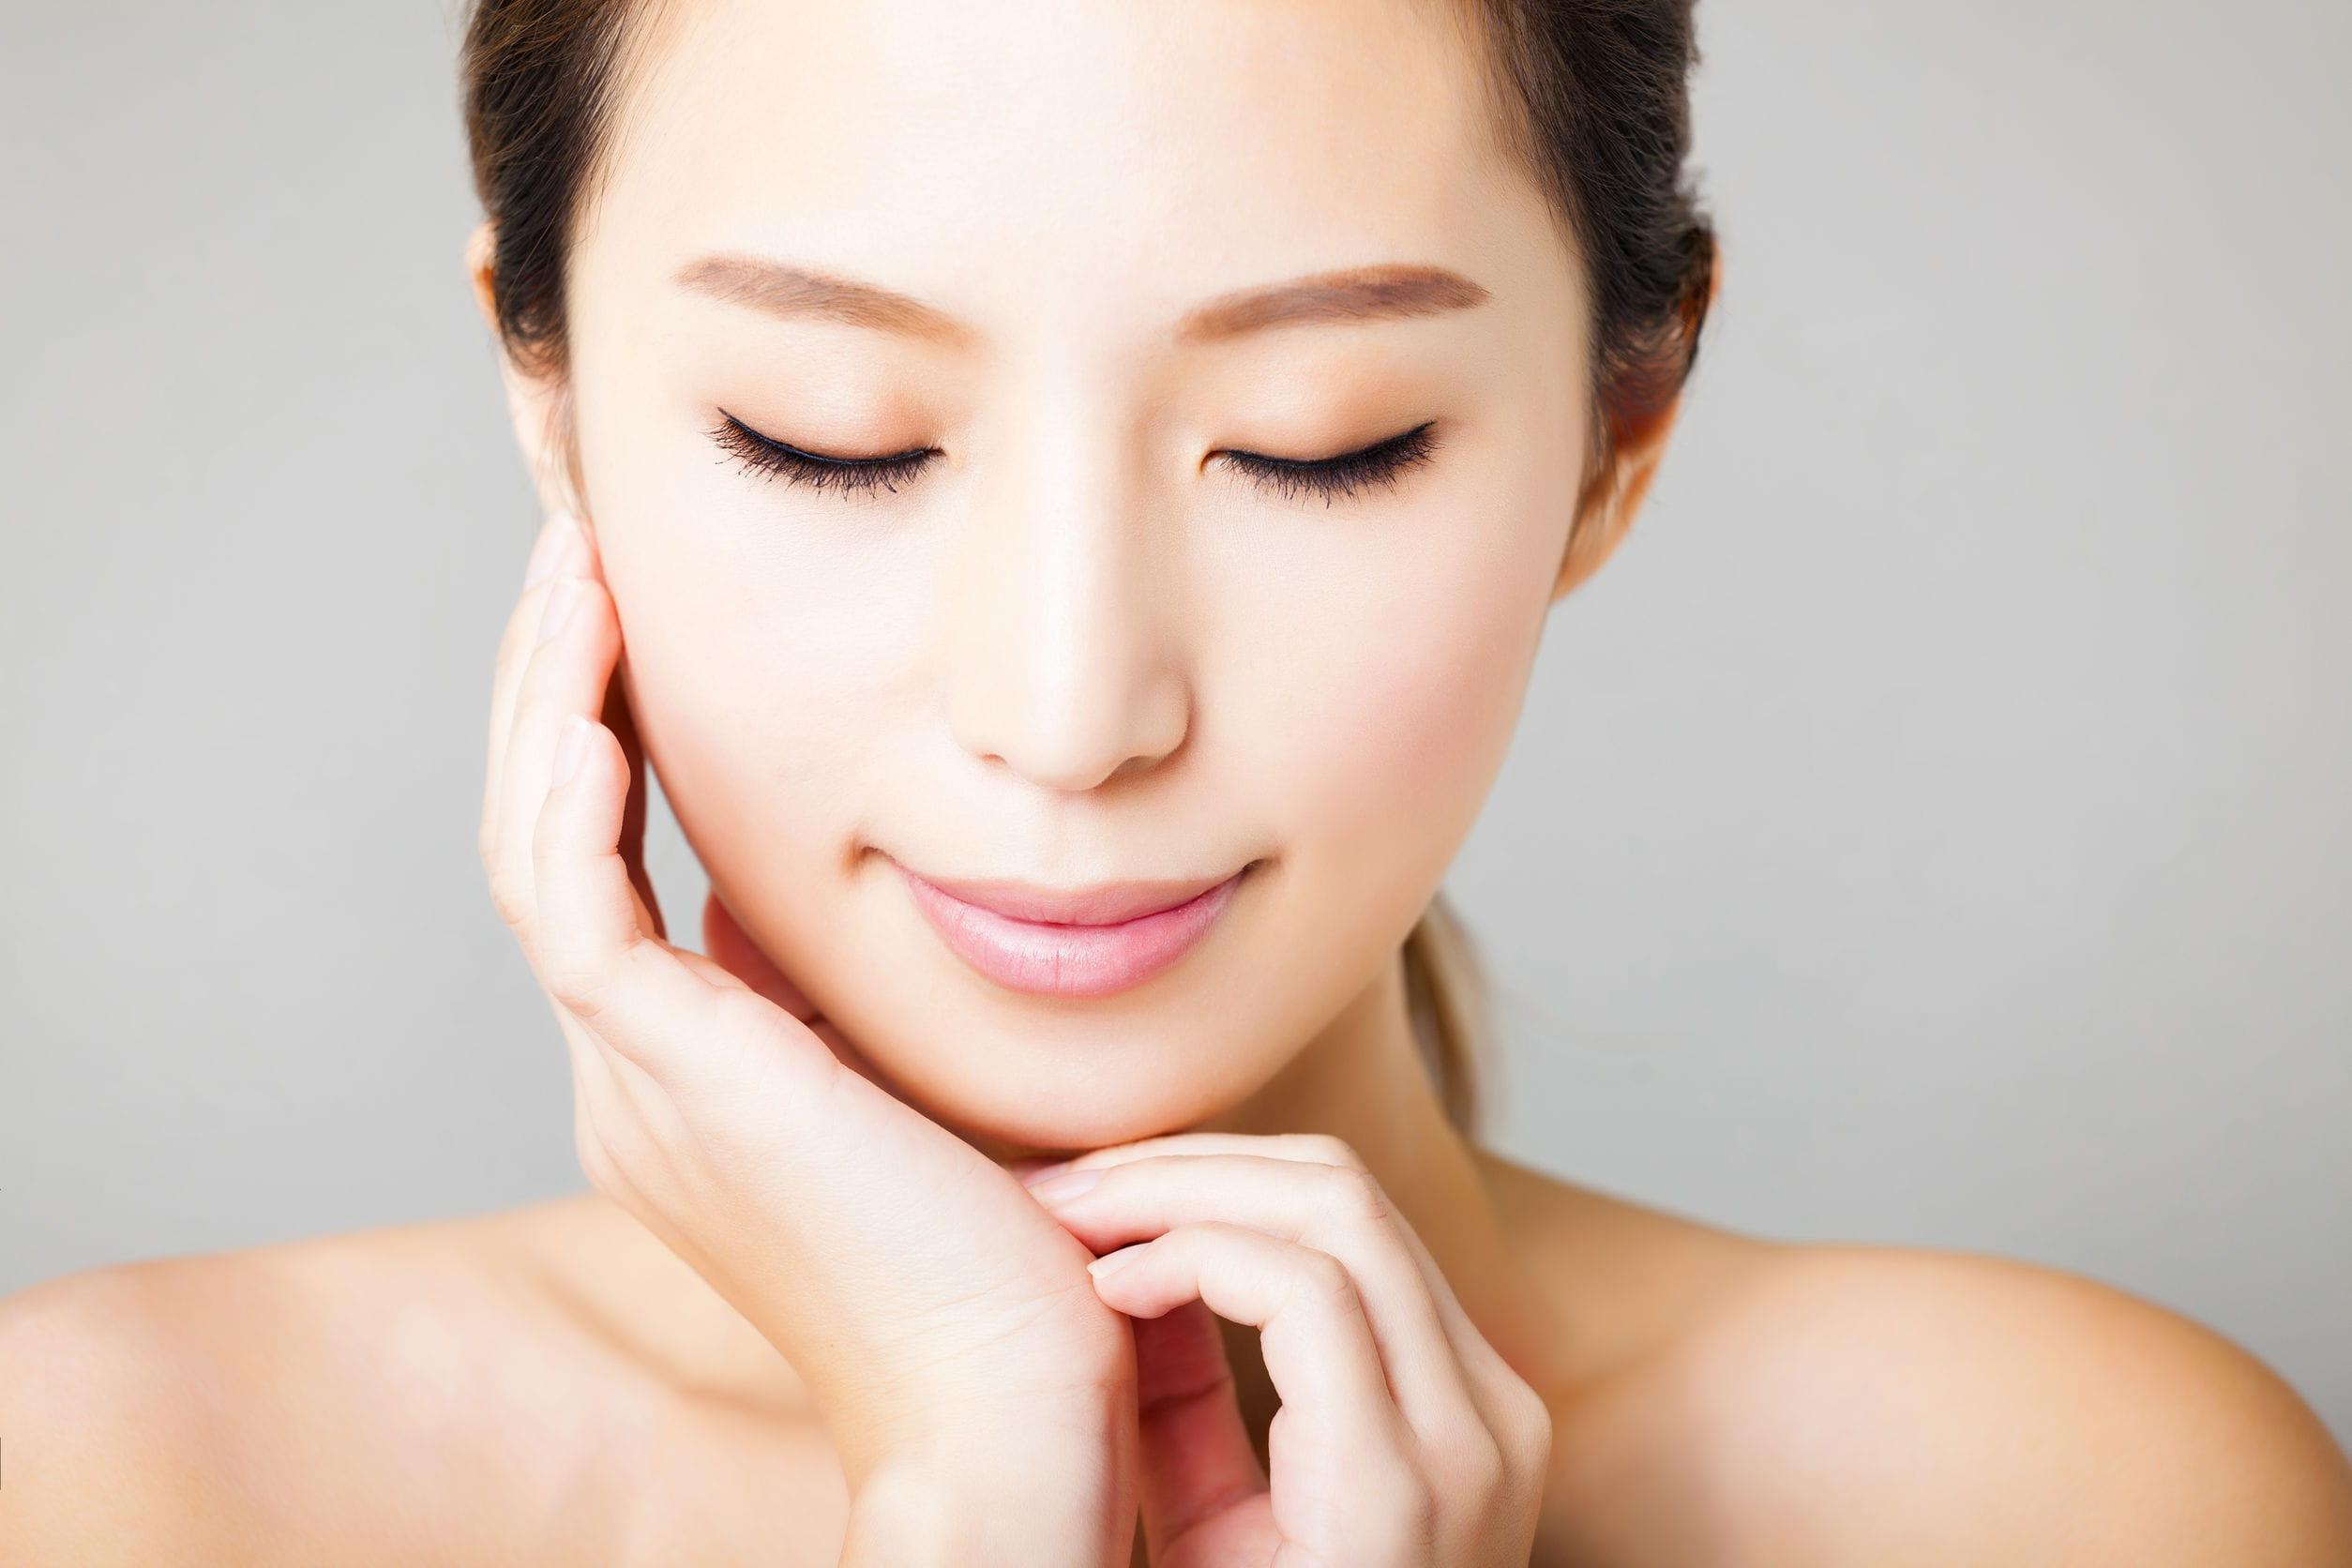 Massage asiatique : technique - Ooreka